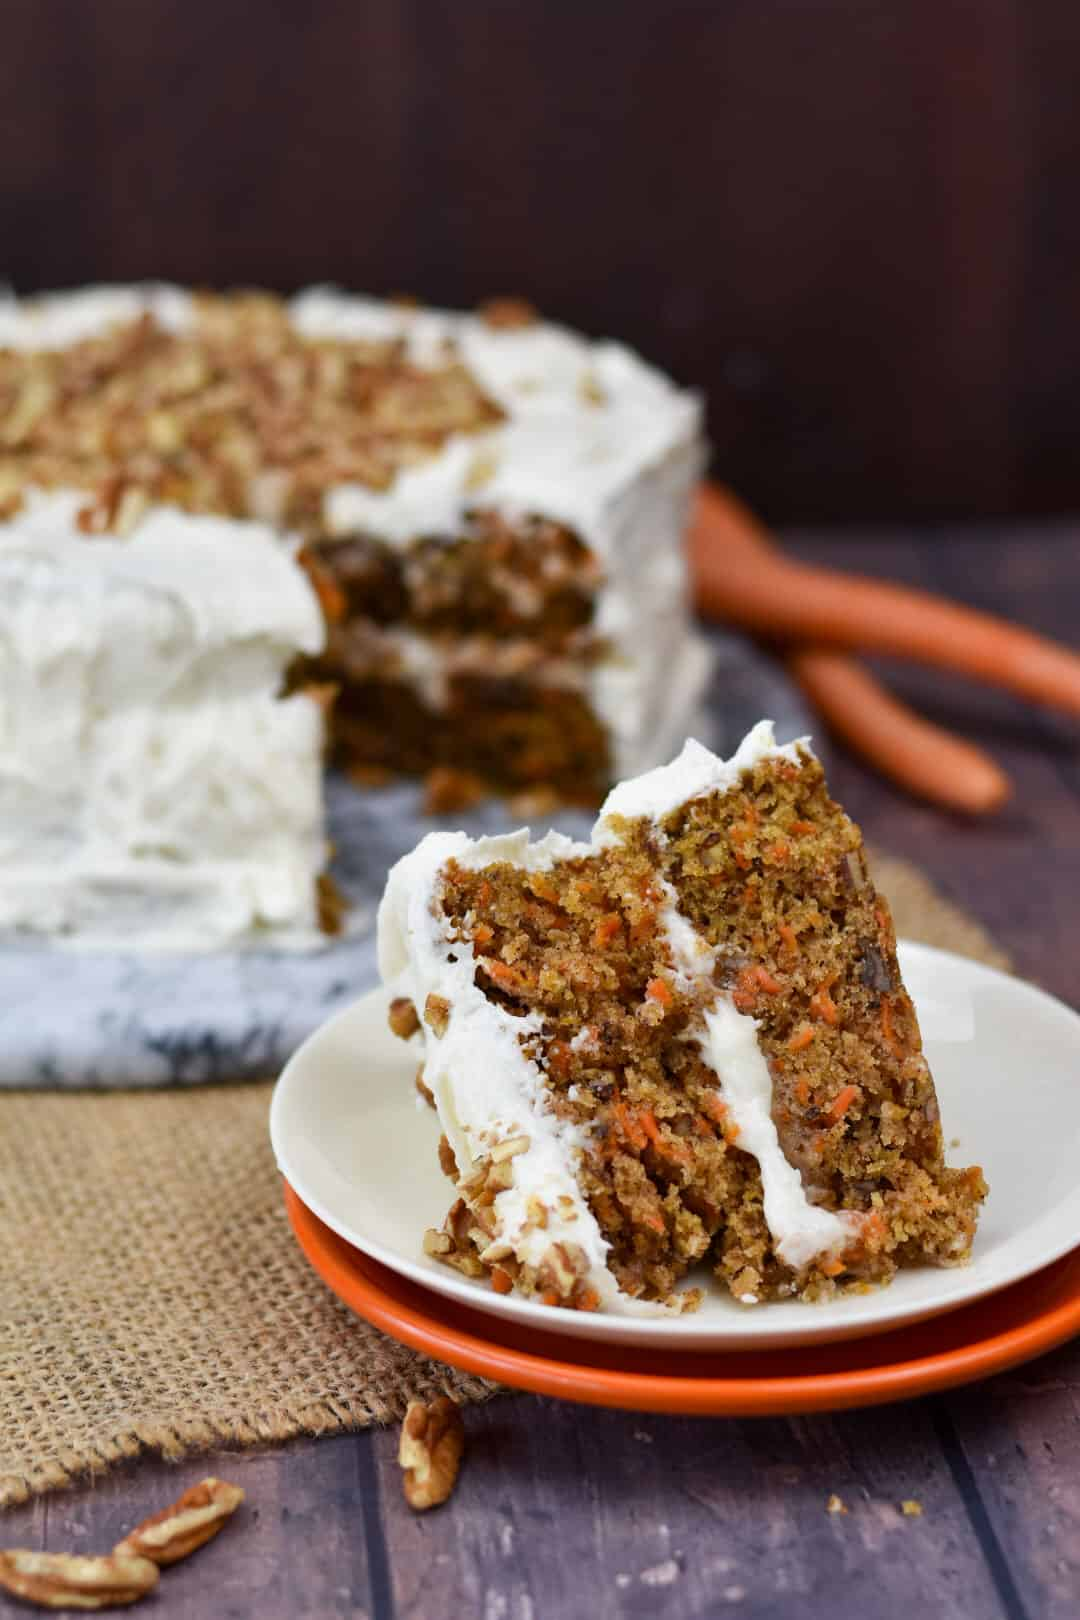 closeup shot of pecan carrot cake slice on a plate